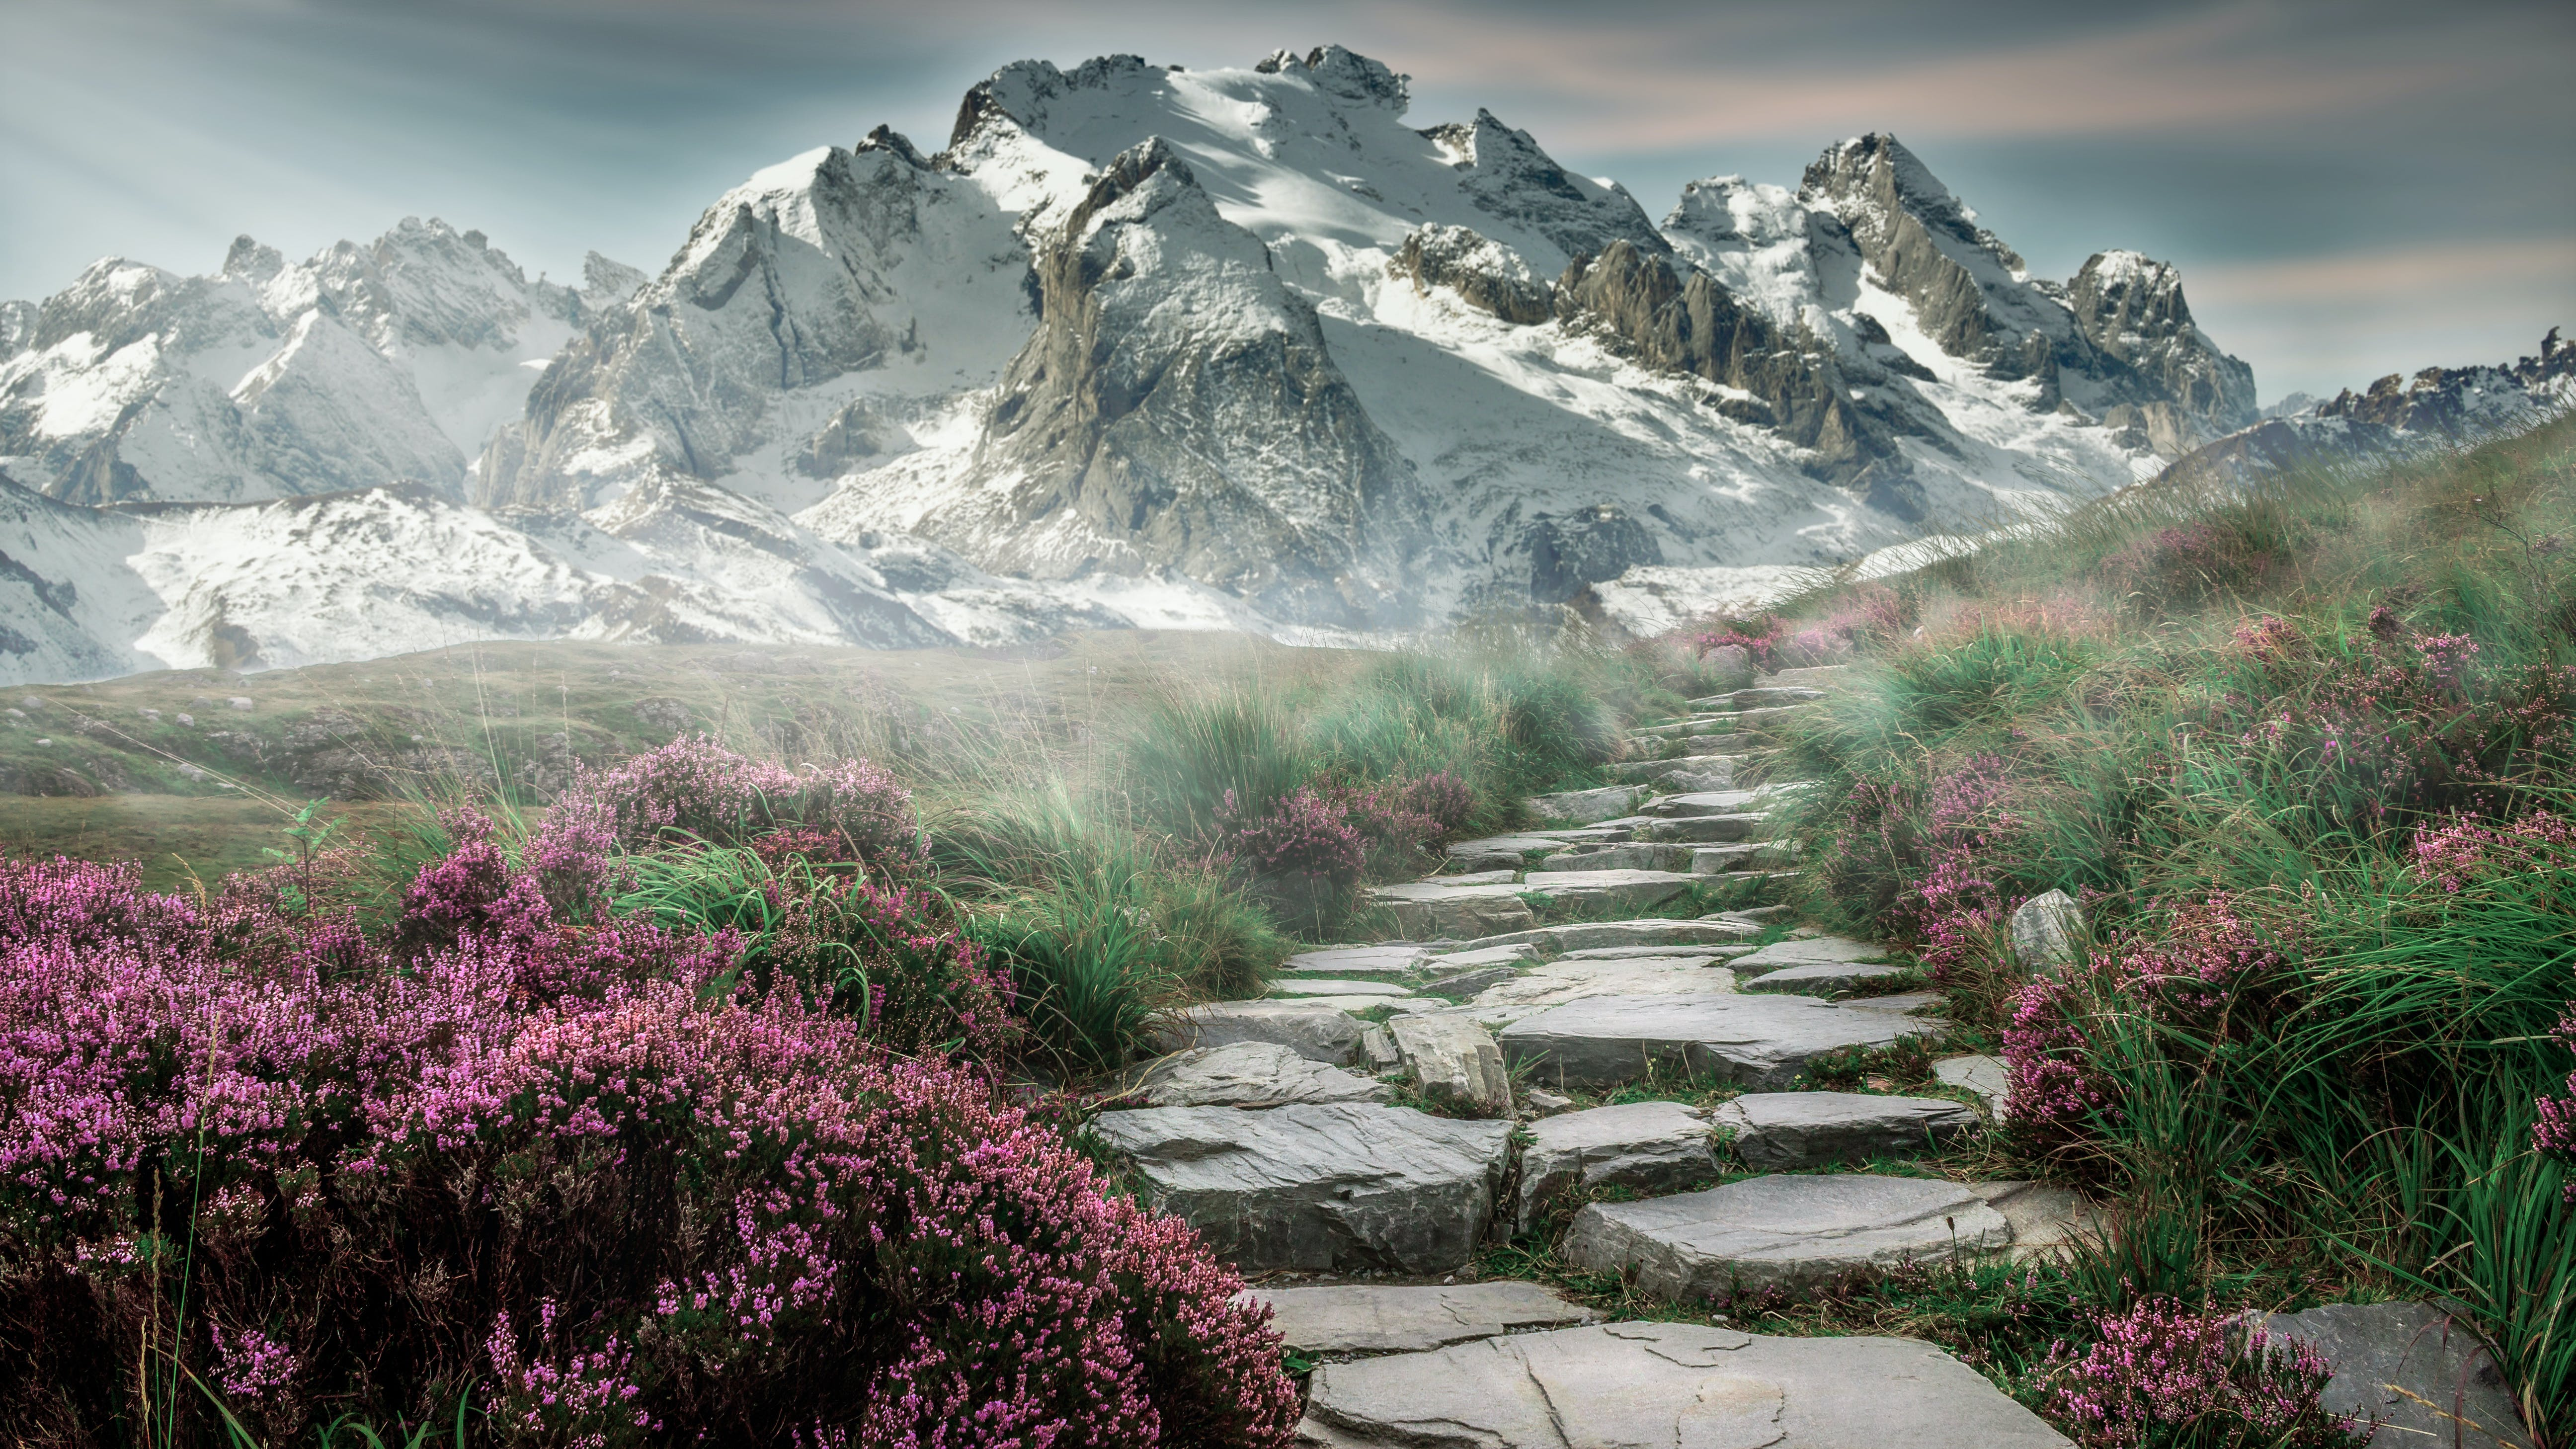 Rock in Between Grass and Flower